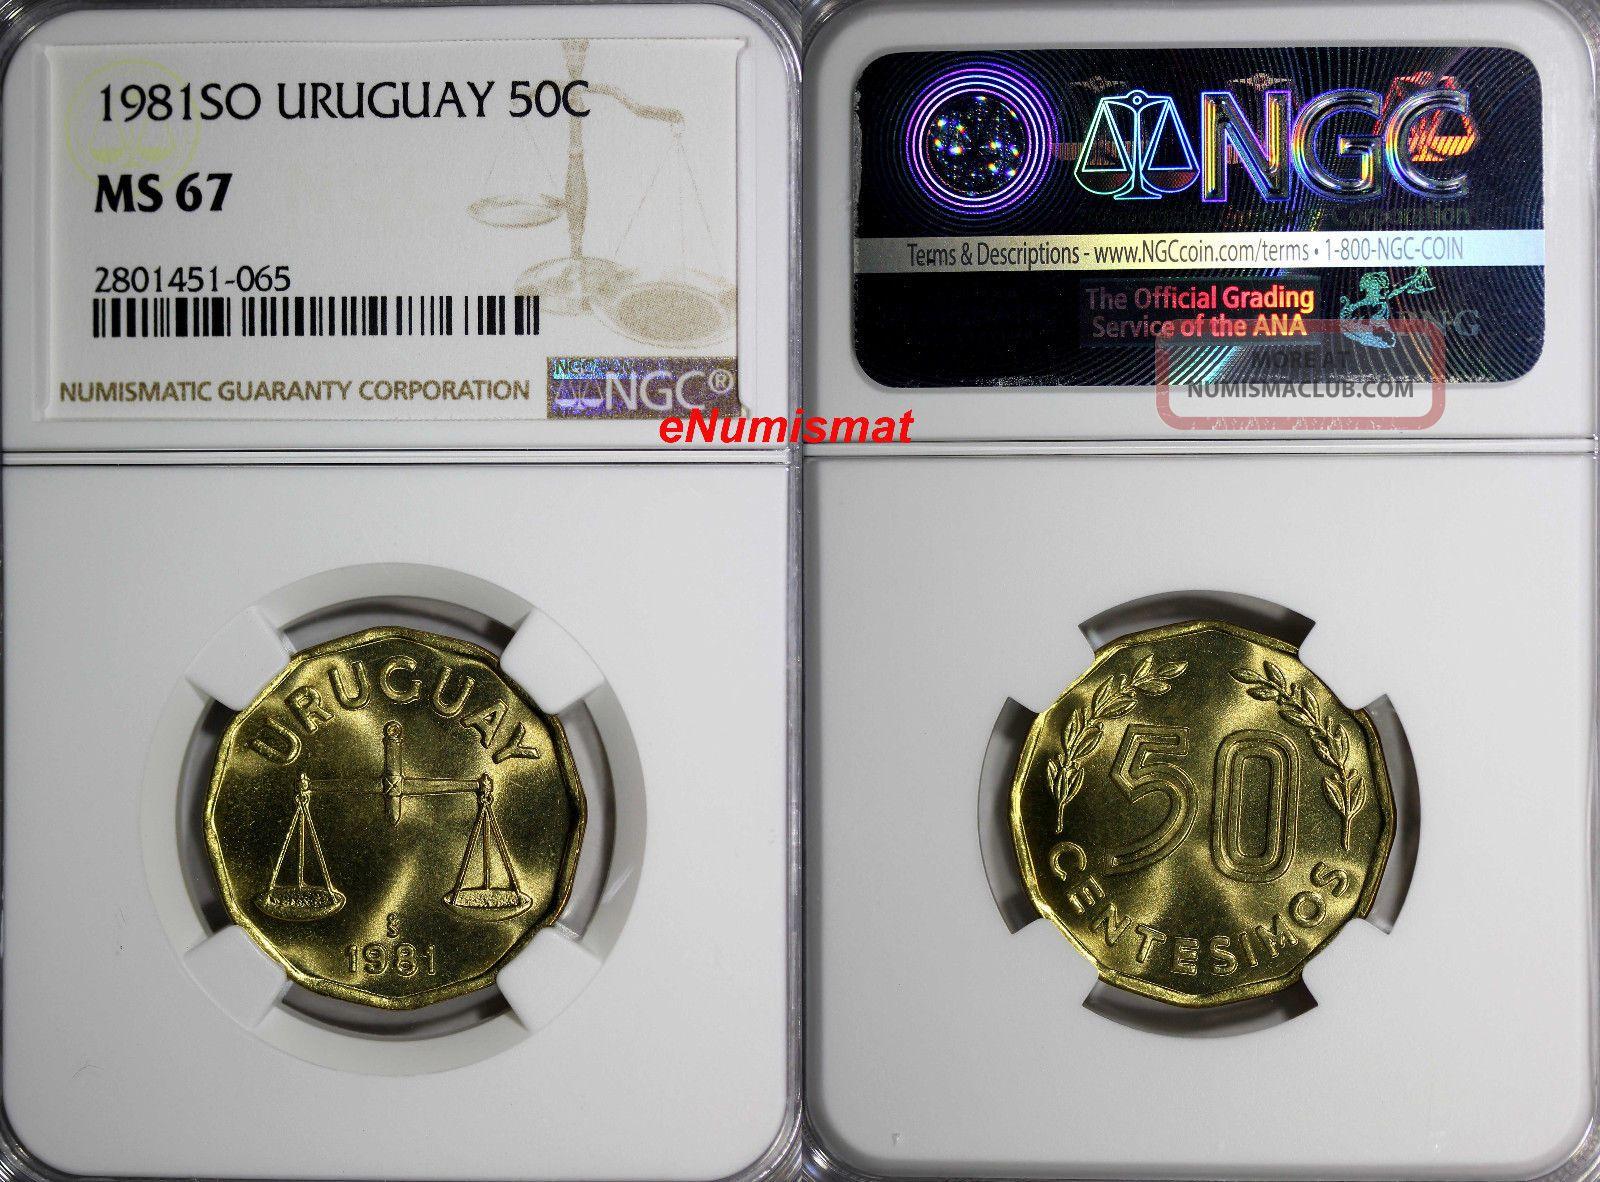 Uruguay 1981 So 50 Centesimos Ngc Ms67 Top Graded Coin Mintage - 200,  000 Km 68 South America photo